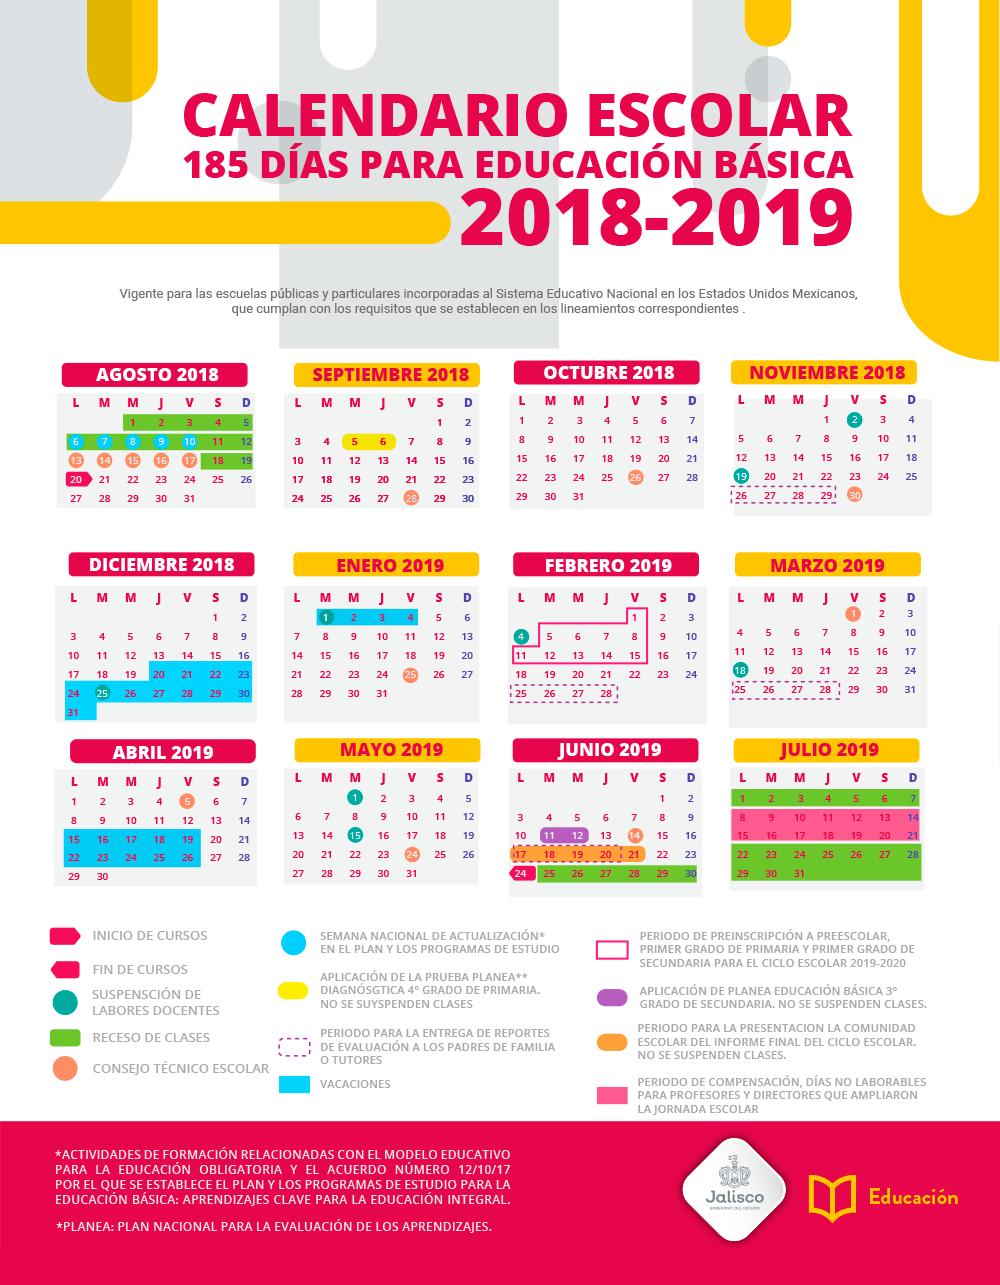 Calendario Escolar Universidad De Panama 2019.Calendario Escolar Portalsej